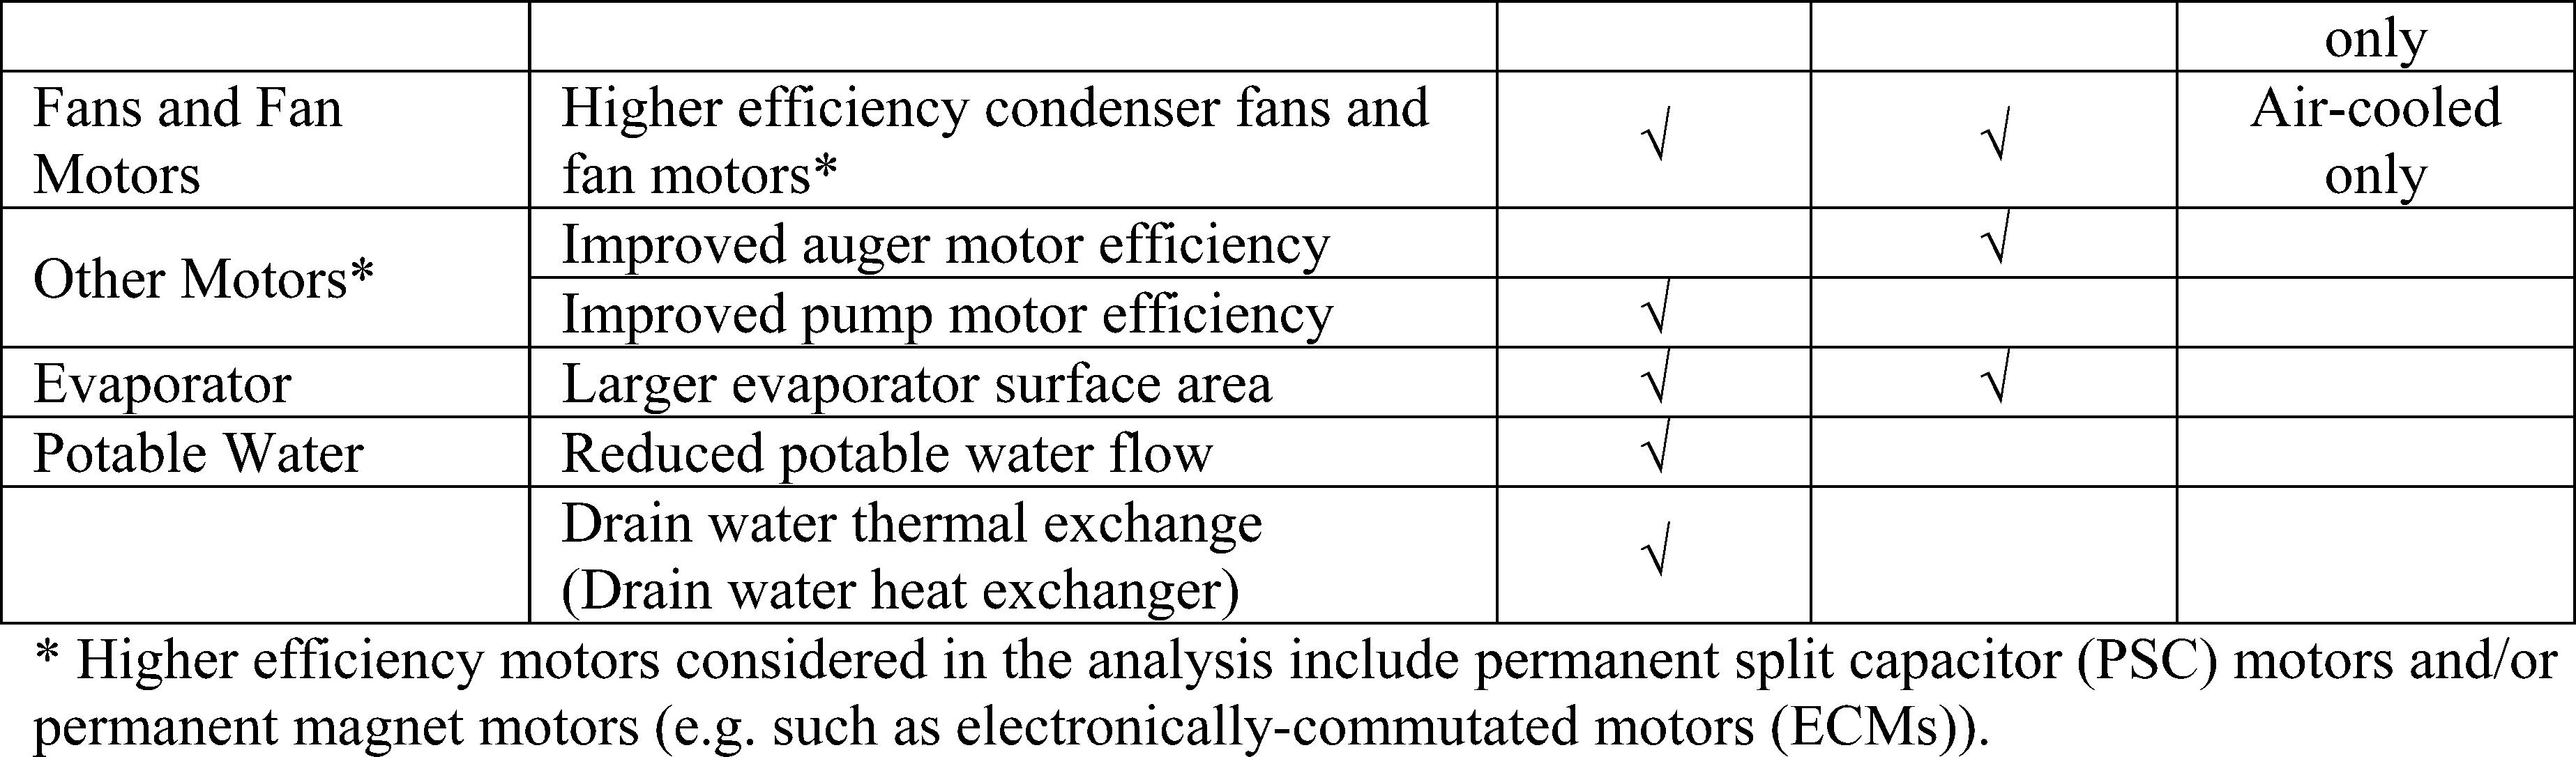 Federal Register Energy Conservation Program Energy